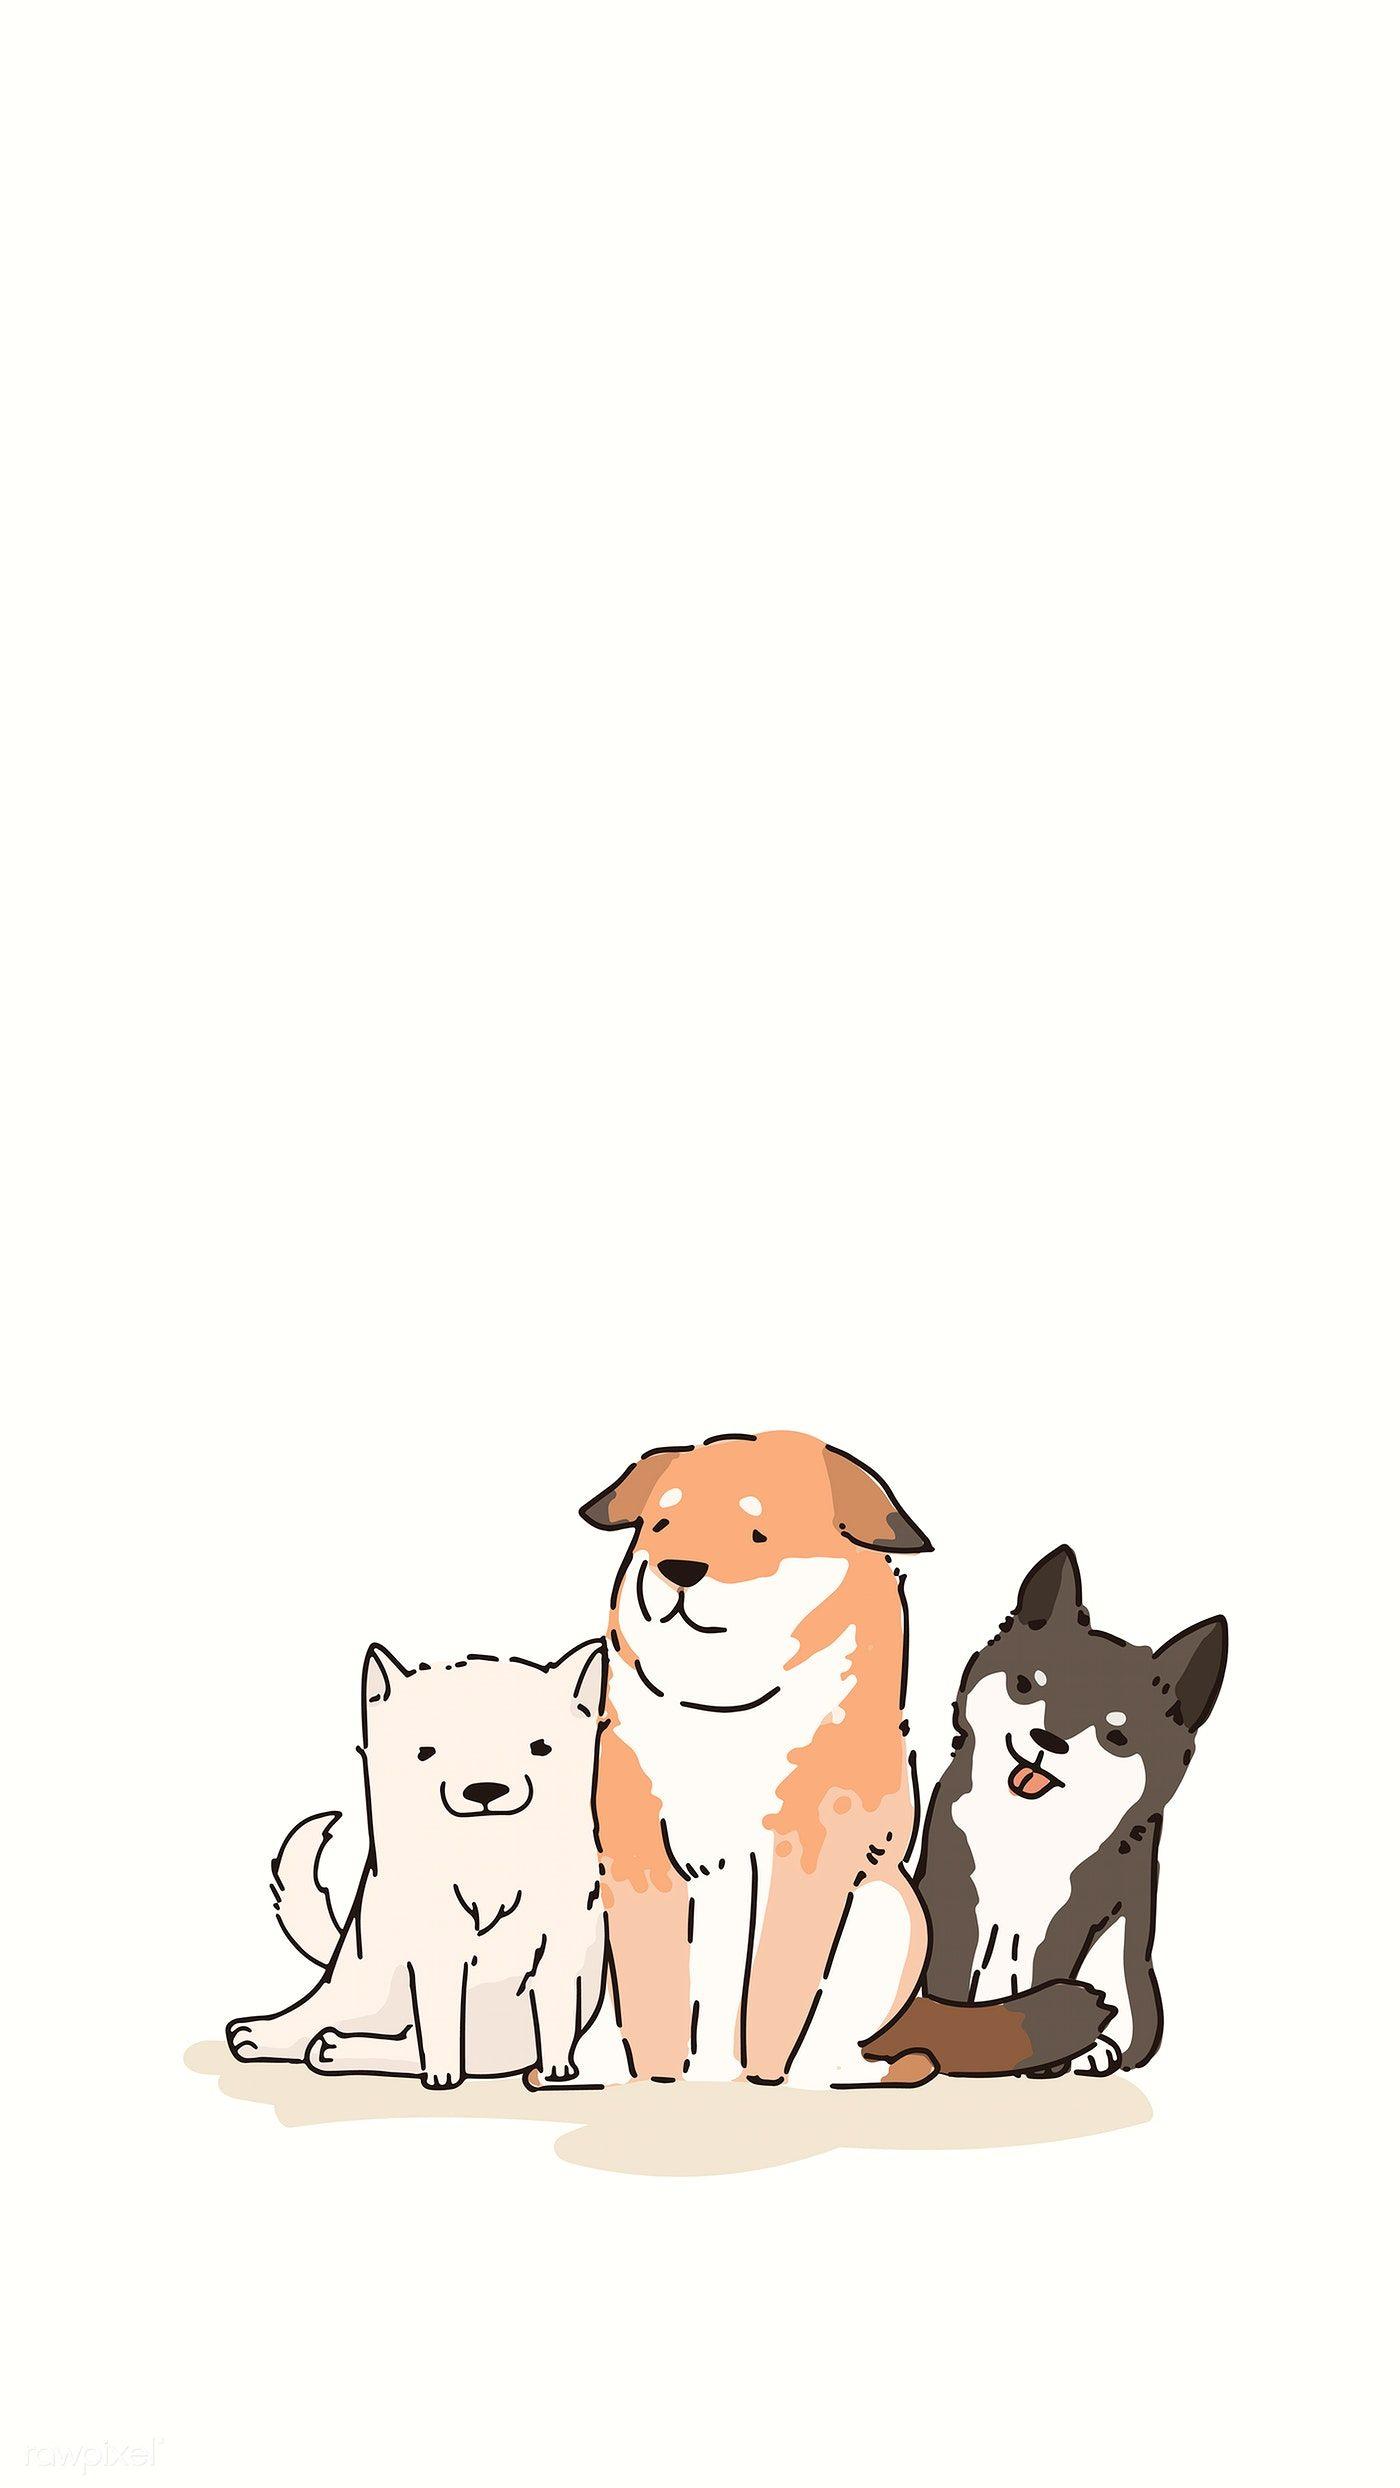 Spitz Dogs Doodle Element Vector Premium Image By Rawpixel Com Niwat Dog Wallpaper Iphone Cute Dog Wallpaper Dog Wallpaper